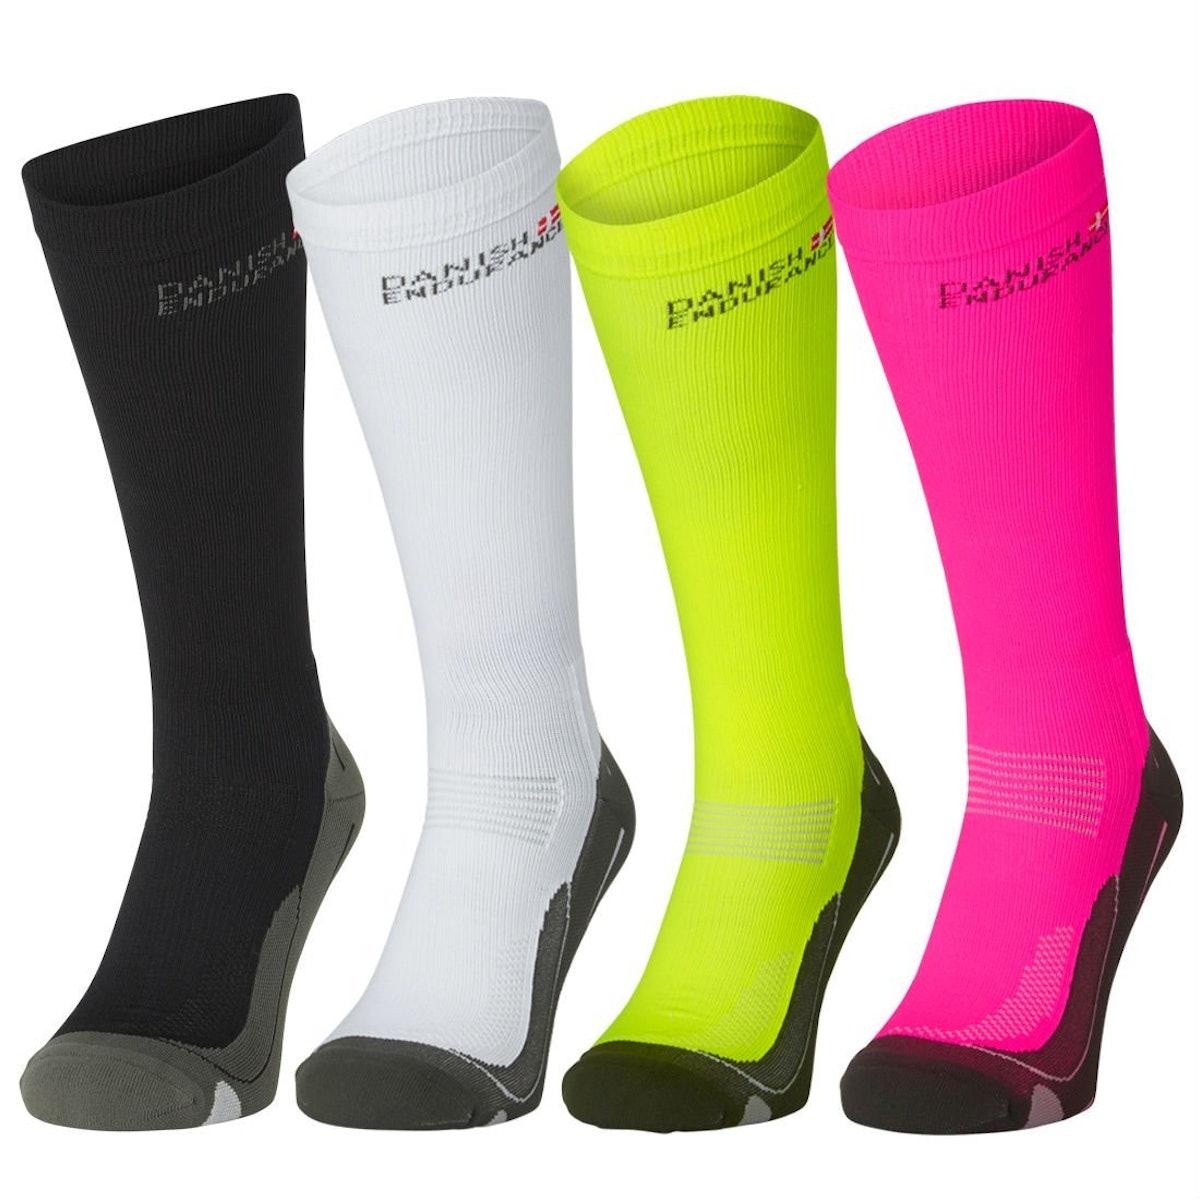 DANISH ENDURANCE Graduated Compression Socks